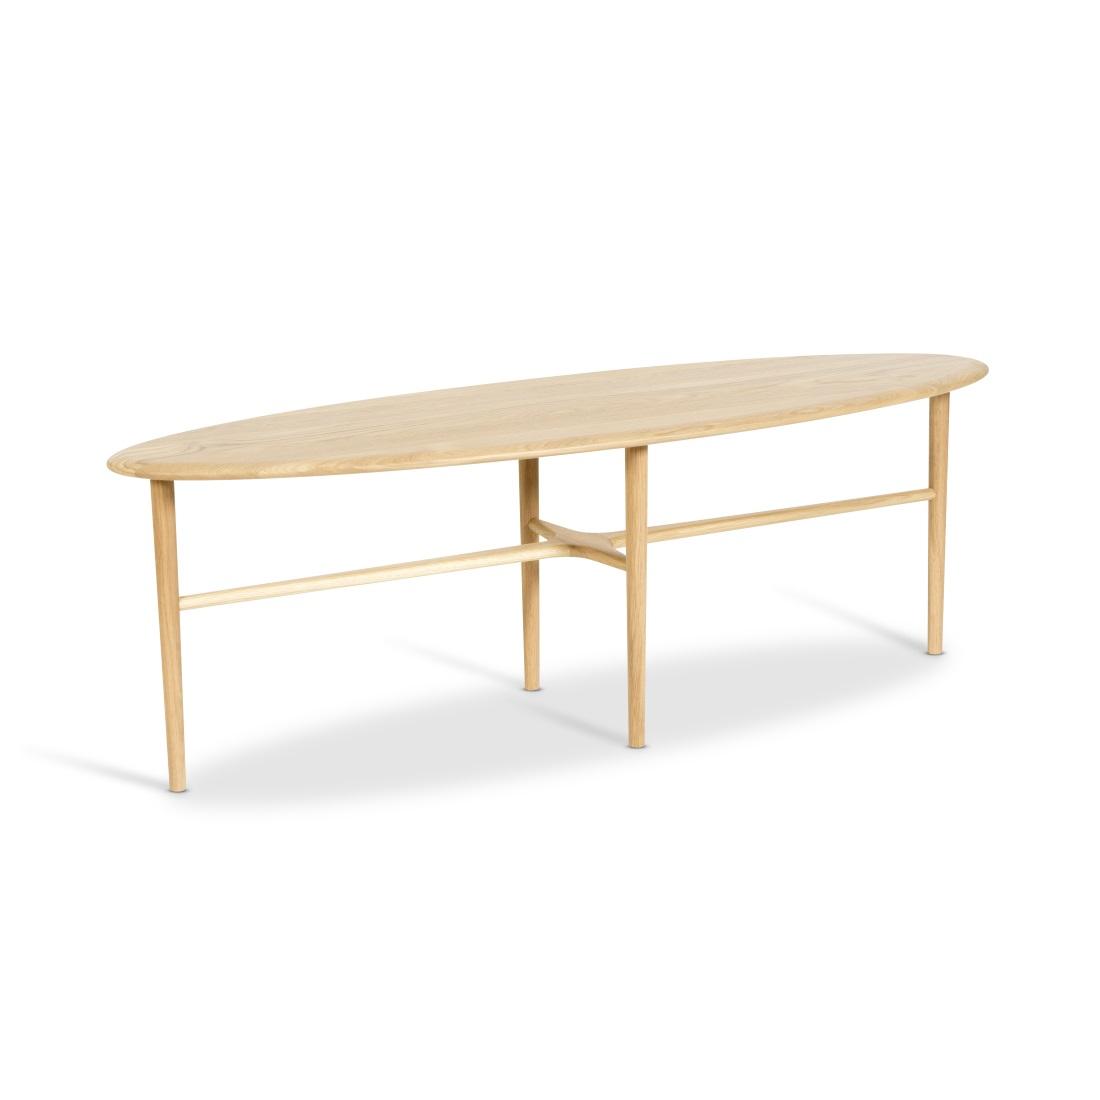 CREST avlångt bord ljus ek, Mavis